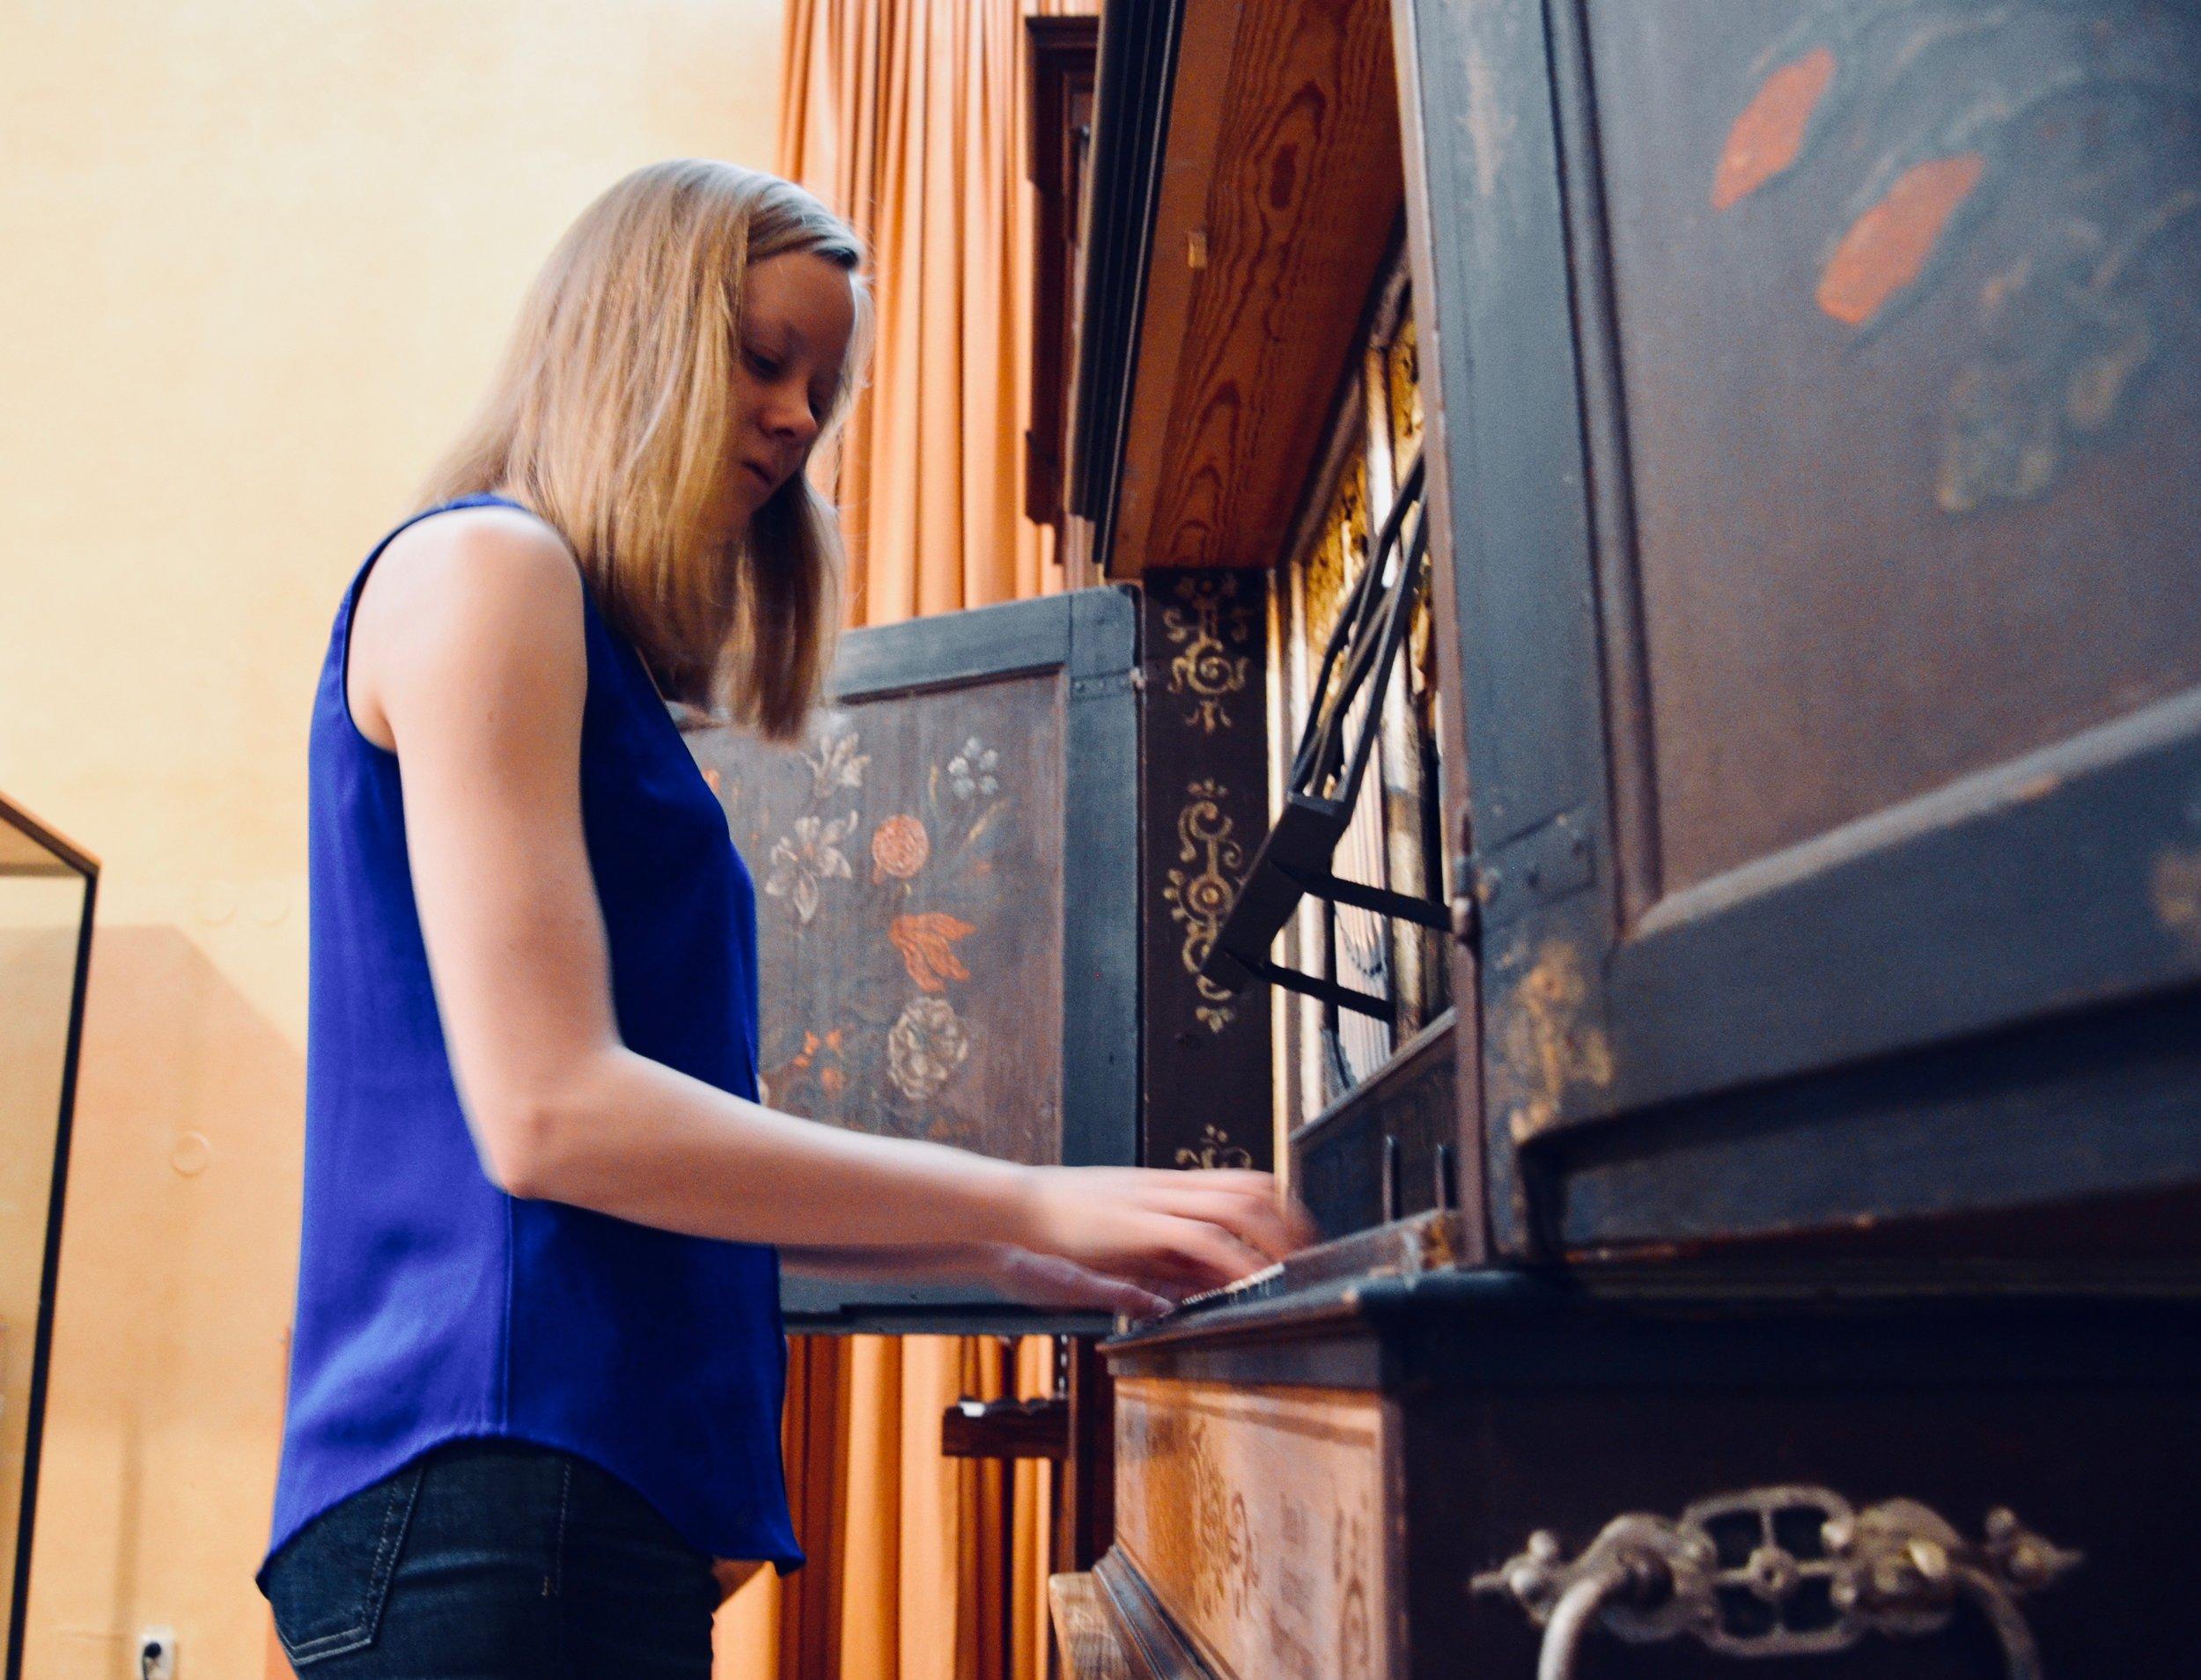 Laura Gullett plays the Manderscheidt organ in Göteborg University.